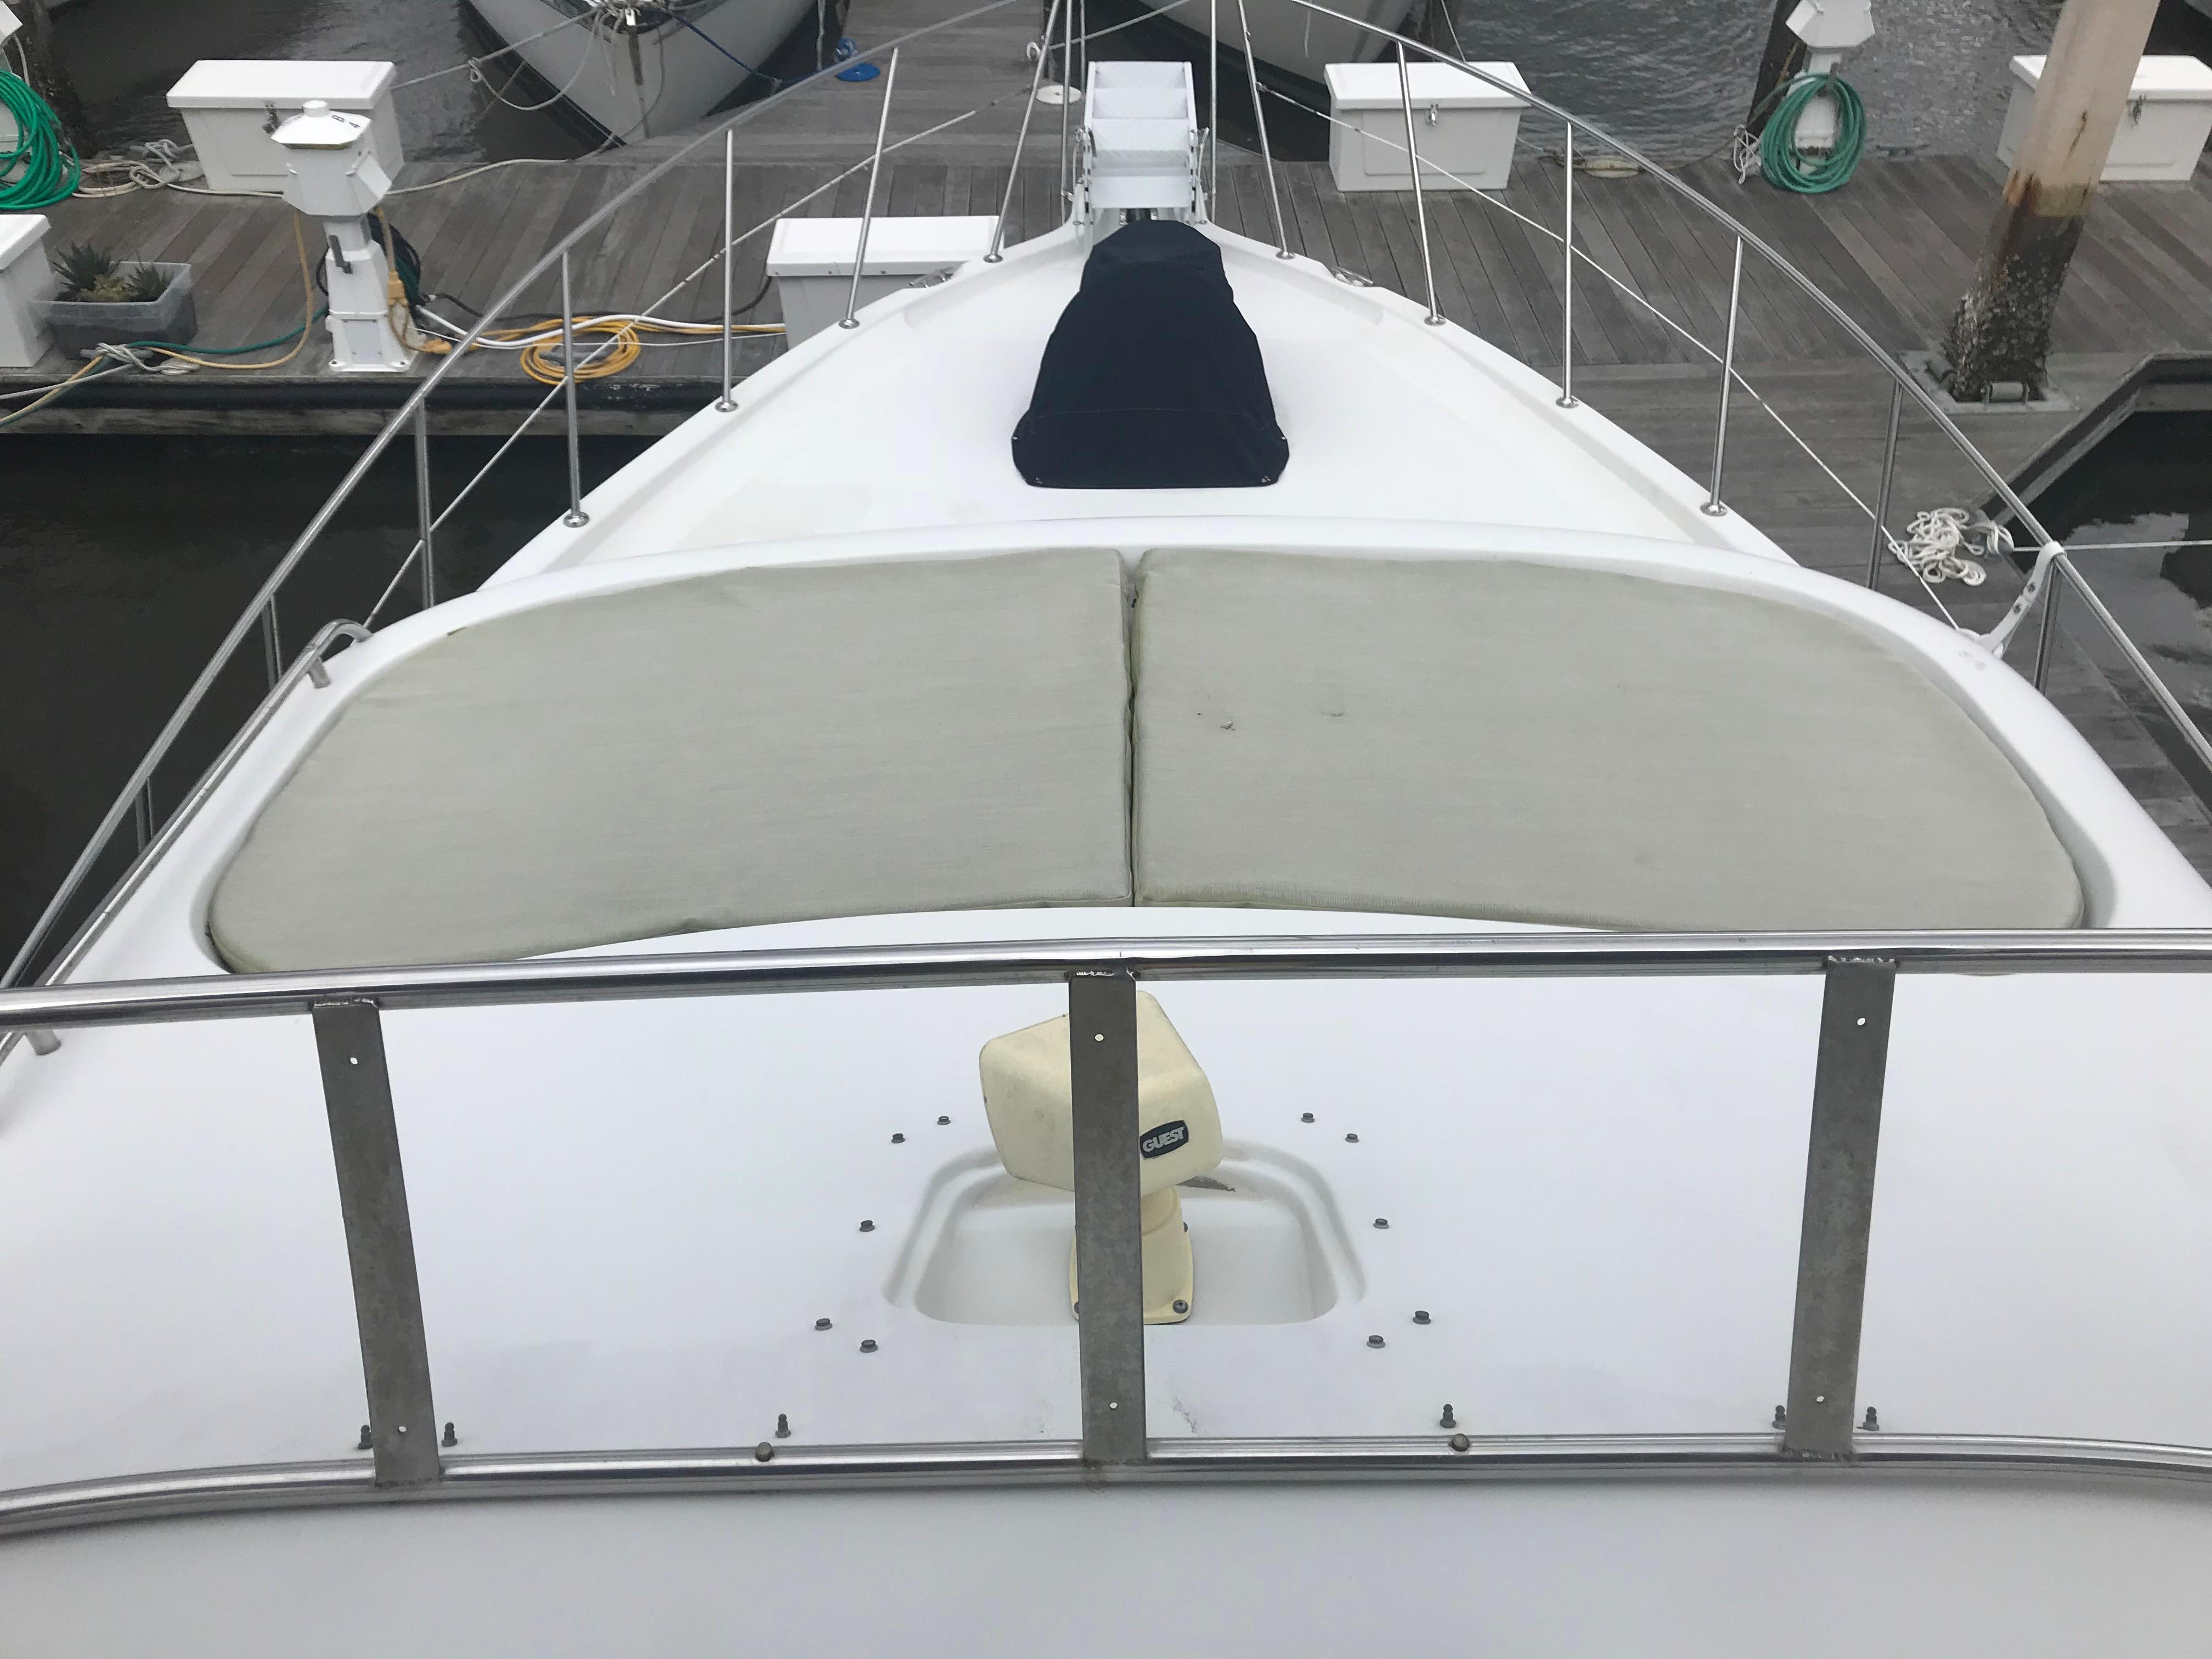 Bluewater Yachts 48 Houseboat - Forward sunpads